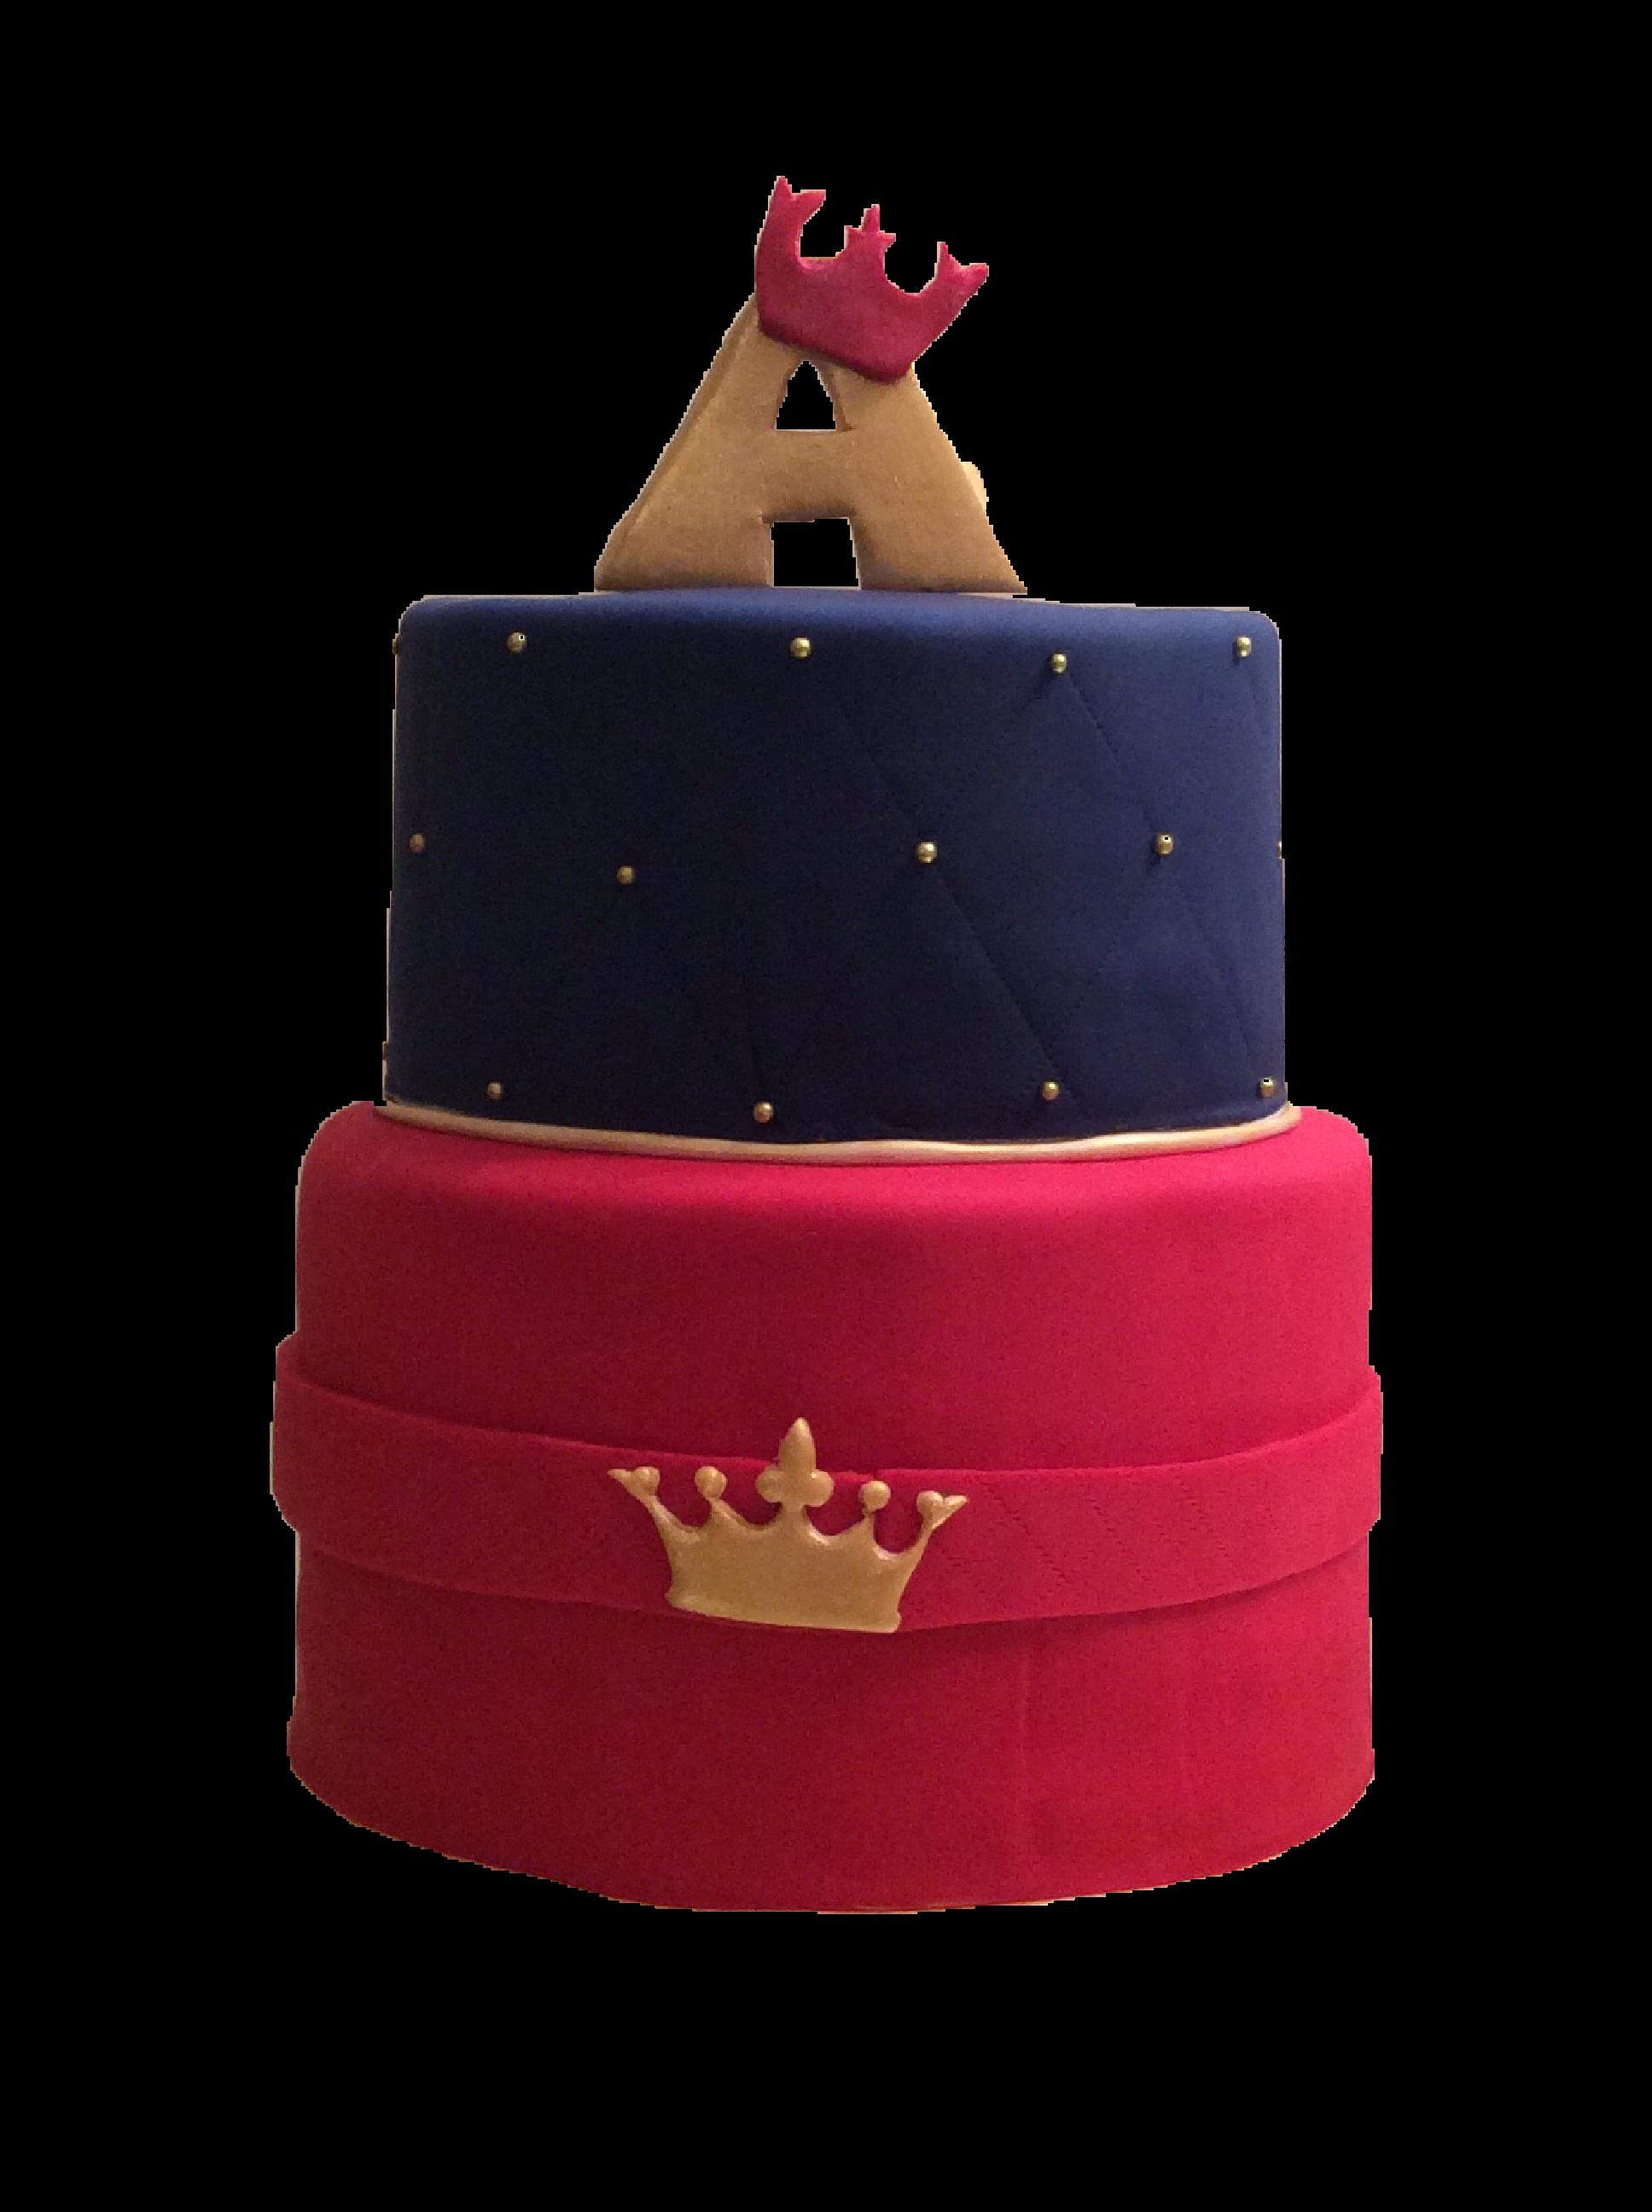 Prince cake